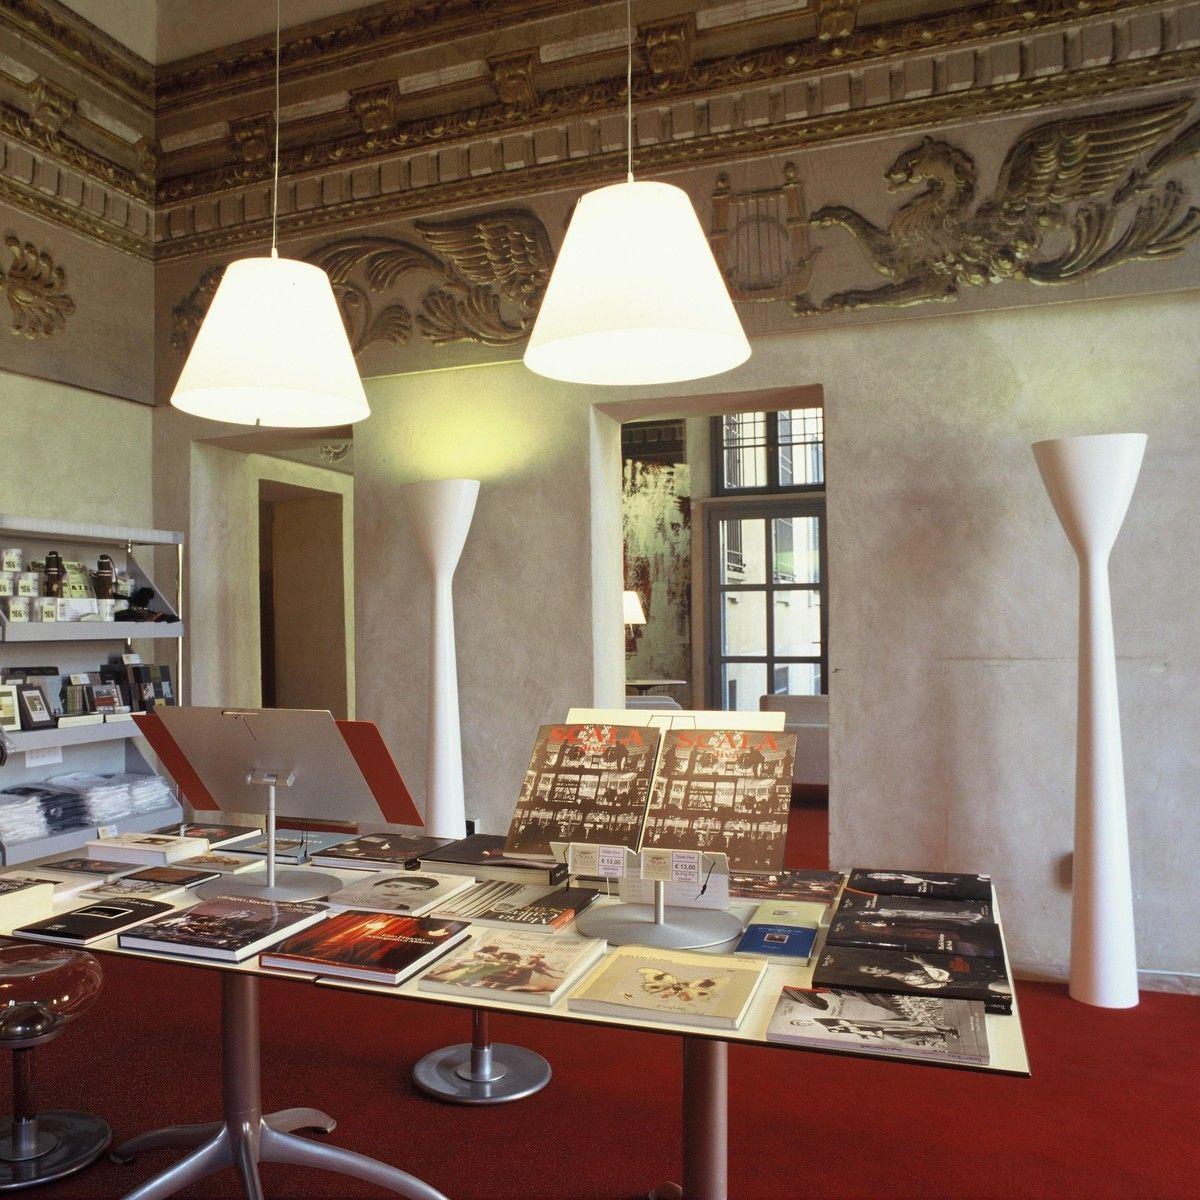 Costanza grande suspension luceplan - Pendelleuchte buro ...